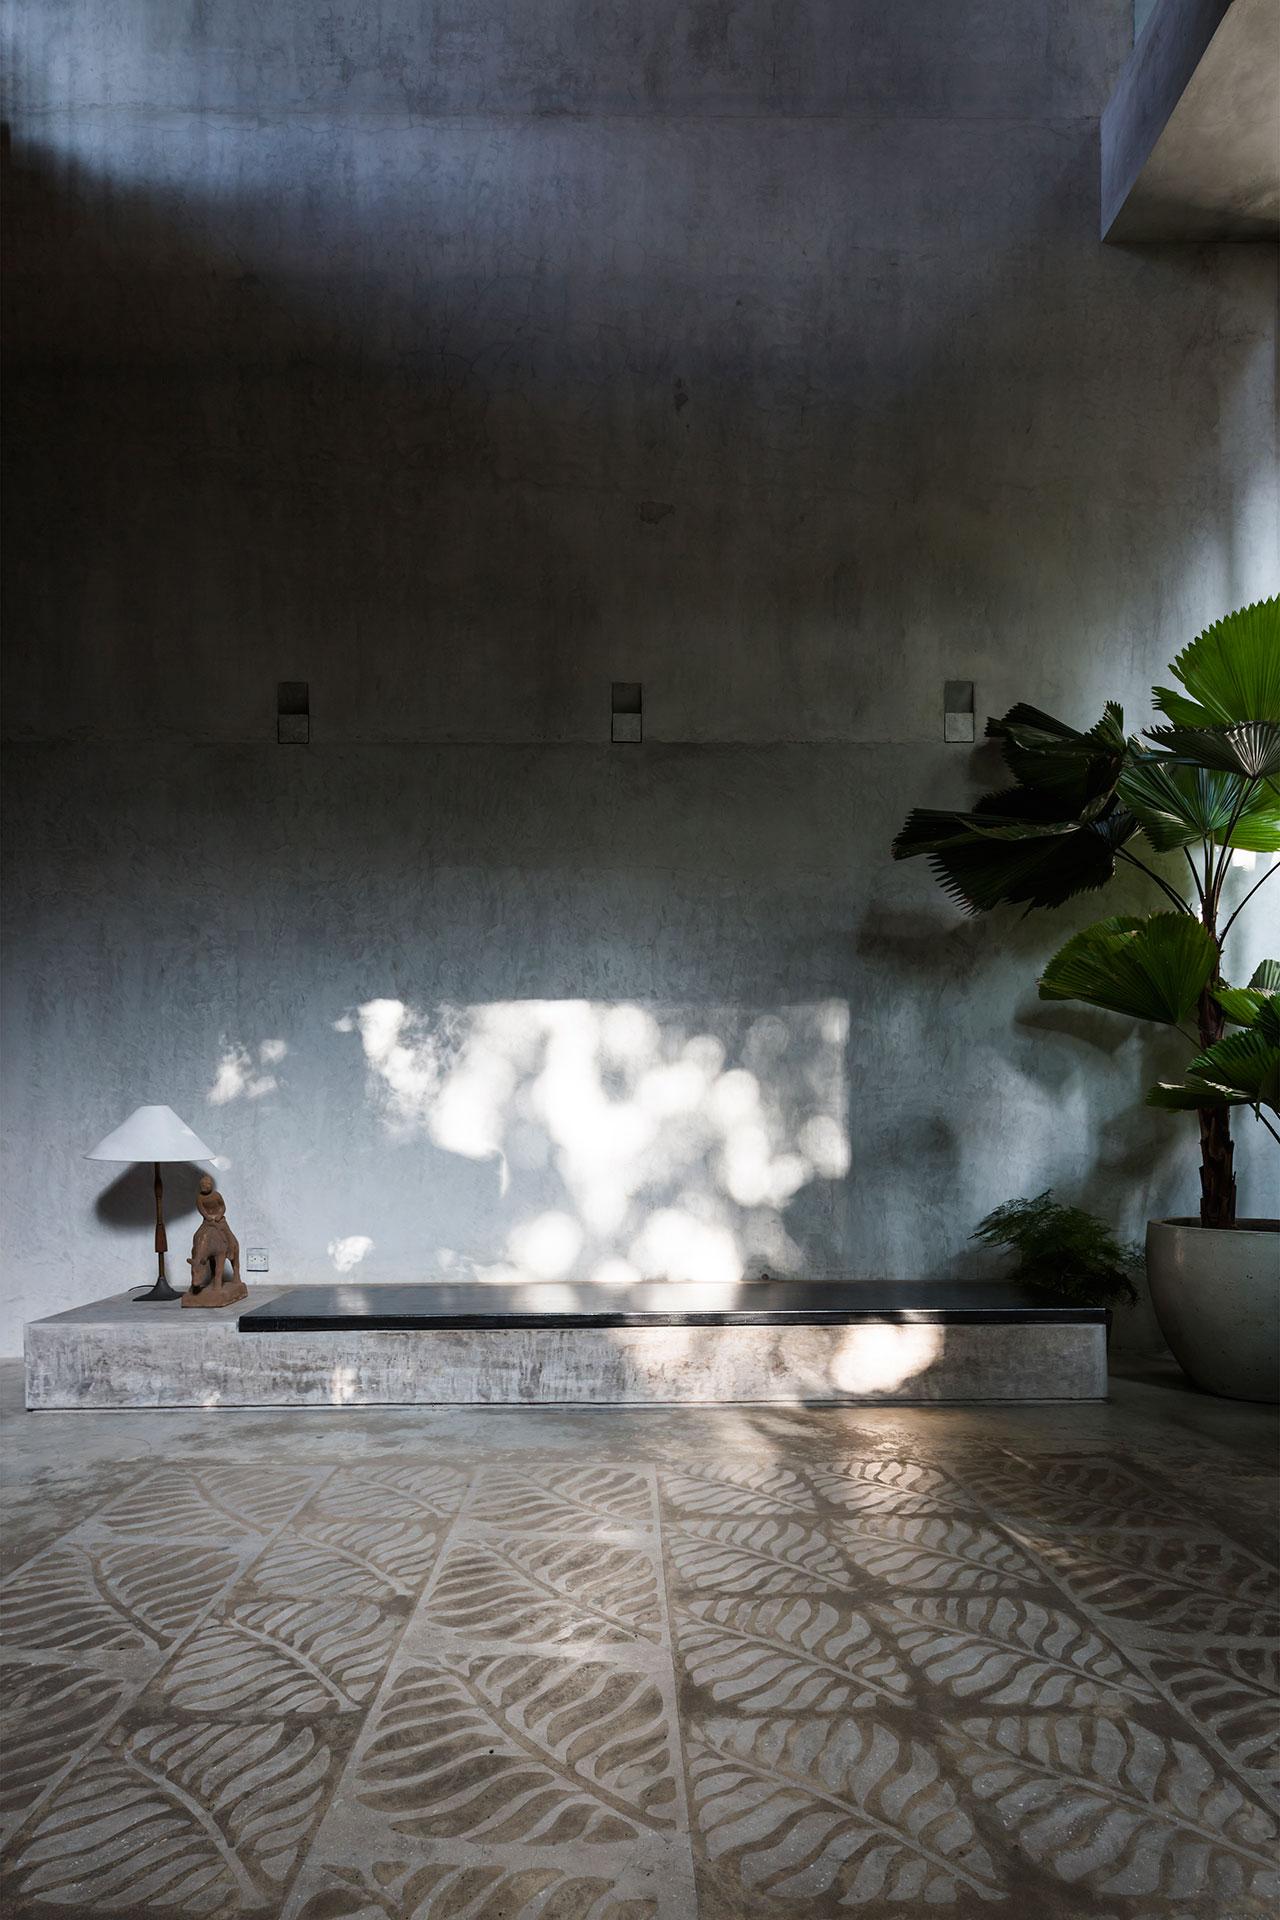 Photo © Hiroyuki Oki.